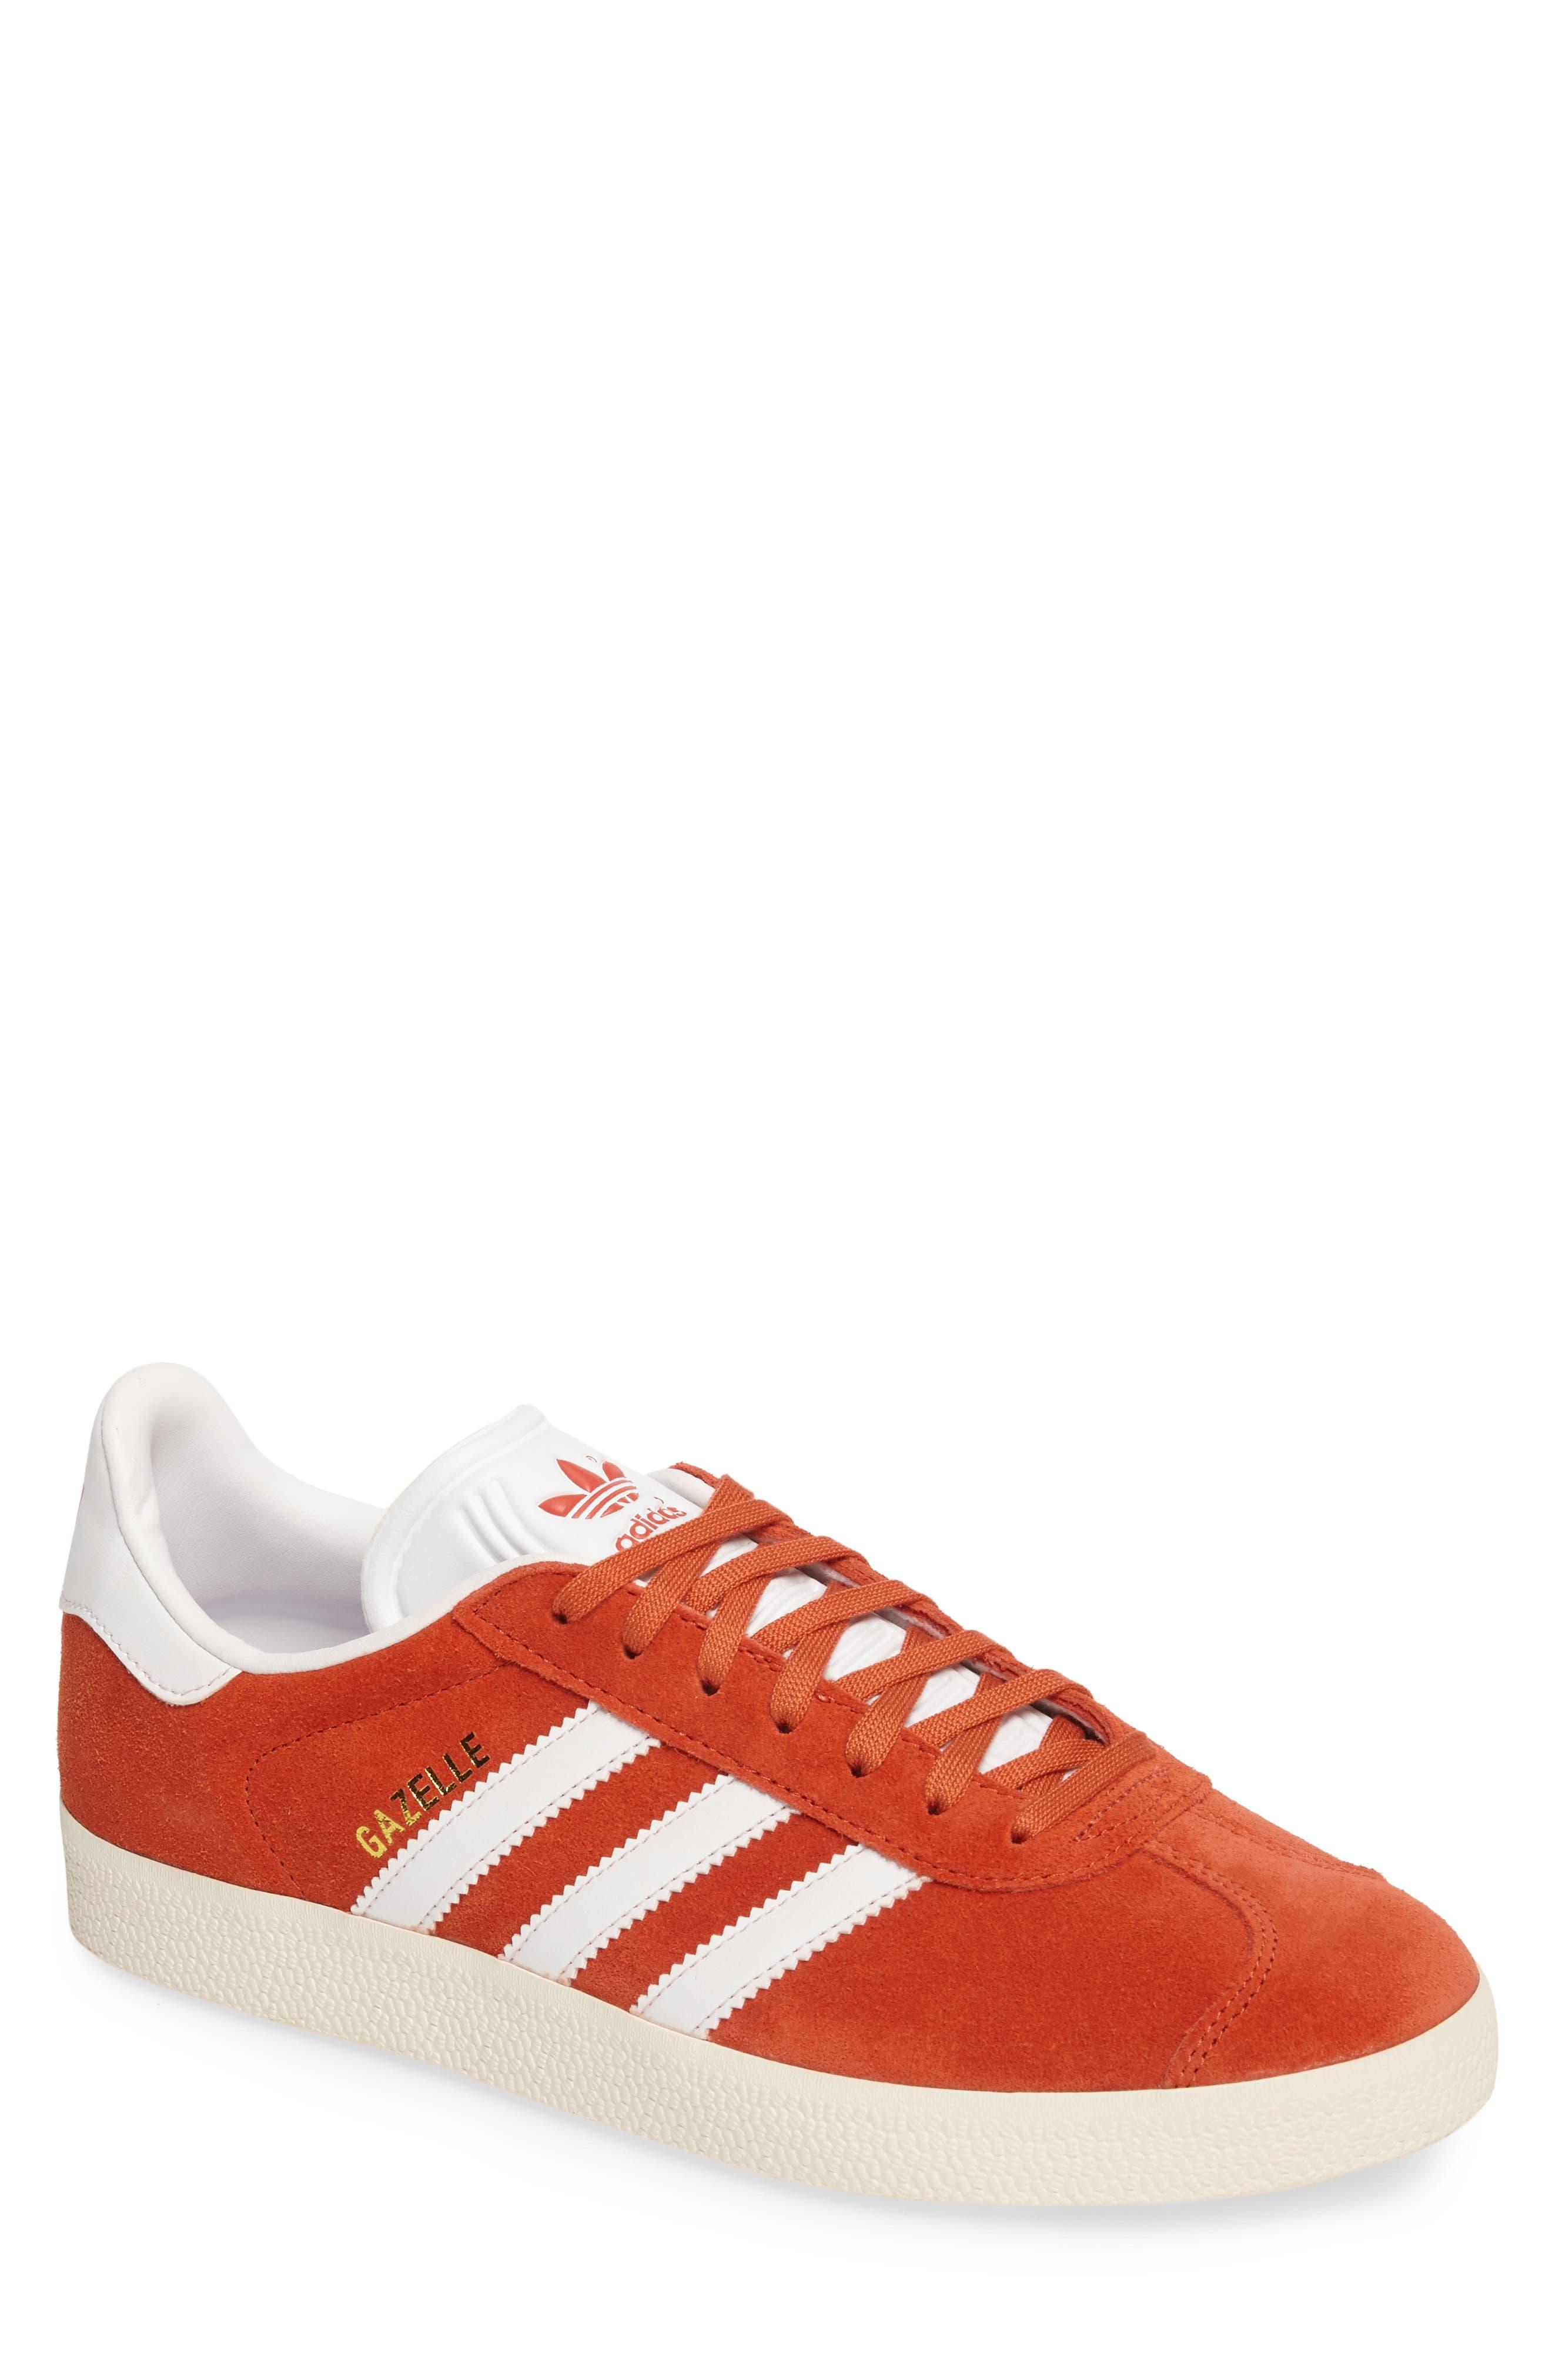 Gazelle Sneaker,                             Main thumbnail 1, color,                             Future Harvest/ White/ Gold